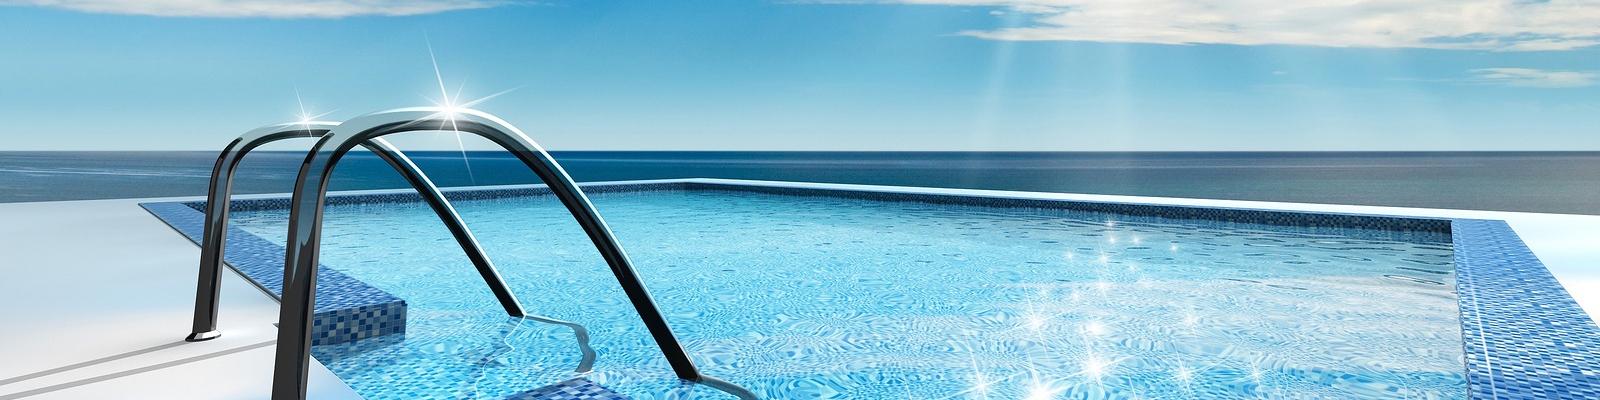 bigstock-Swimming-Pool-2921974-ntb9m5b7207q5qrzo4aii0gkcsnbuv73gn9i9qj5b4